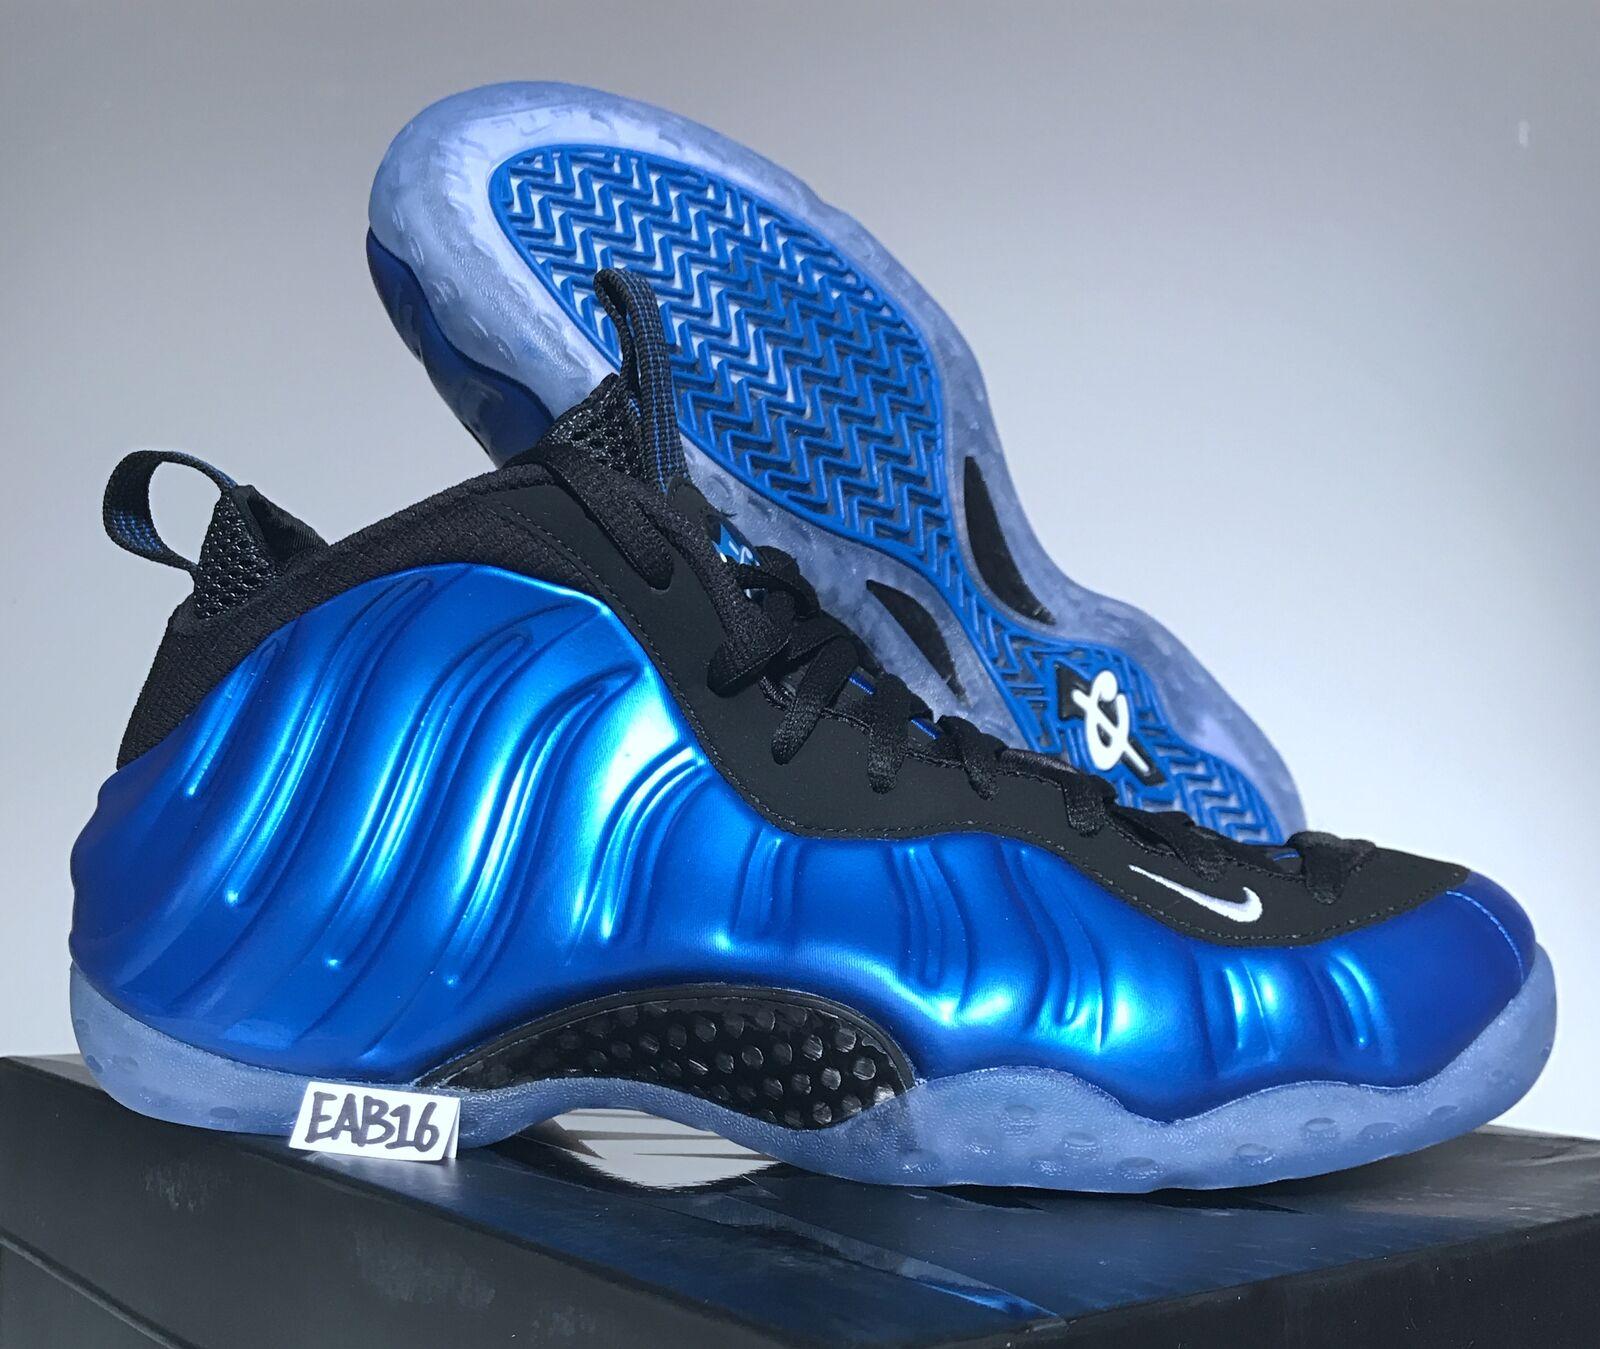 Nike Air Foamposite One XX Dark Neon Royal OG Size Black Blue Foams 895320-500